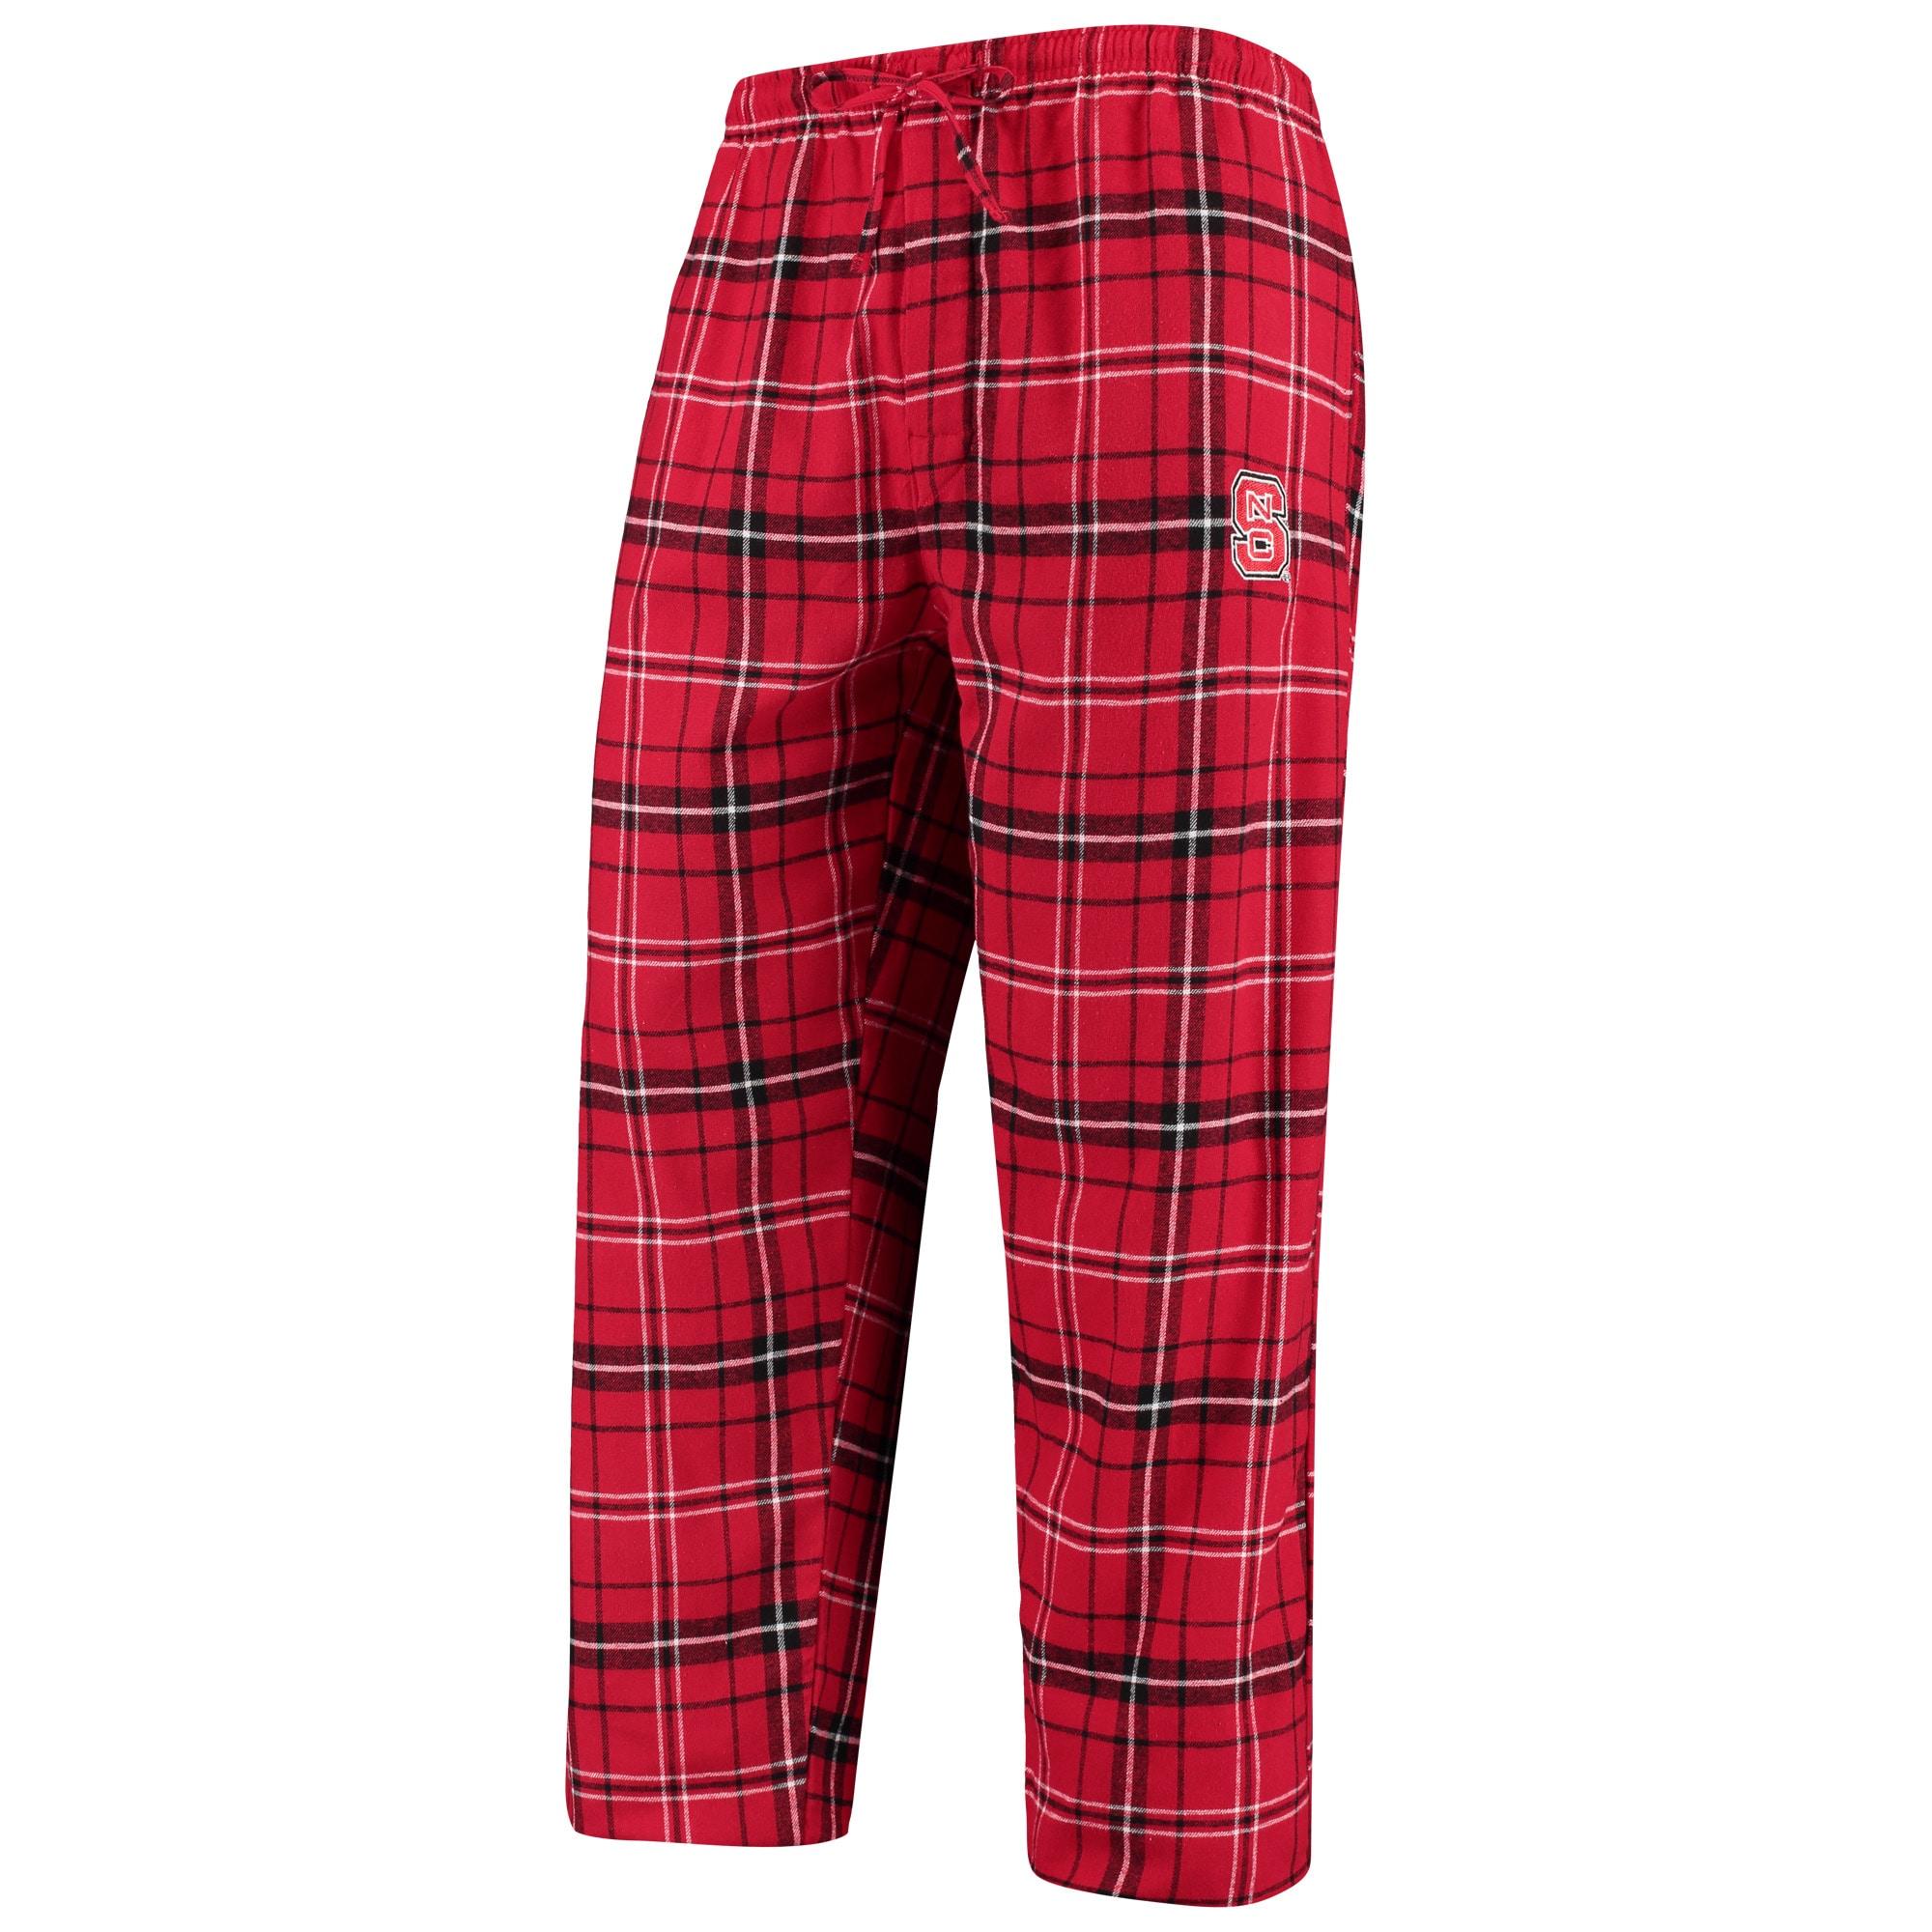 Men/'s Cosi Concepts Gray Black Red Multi Flanel Pj Lounge Pajama Pant Set L 2X